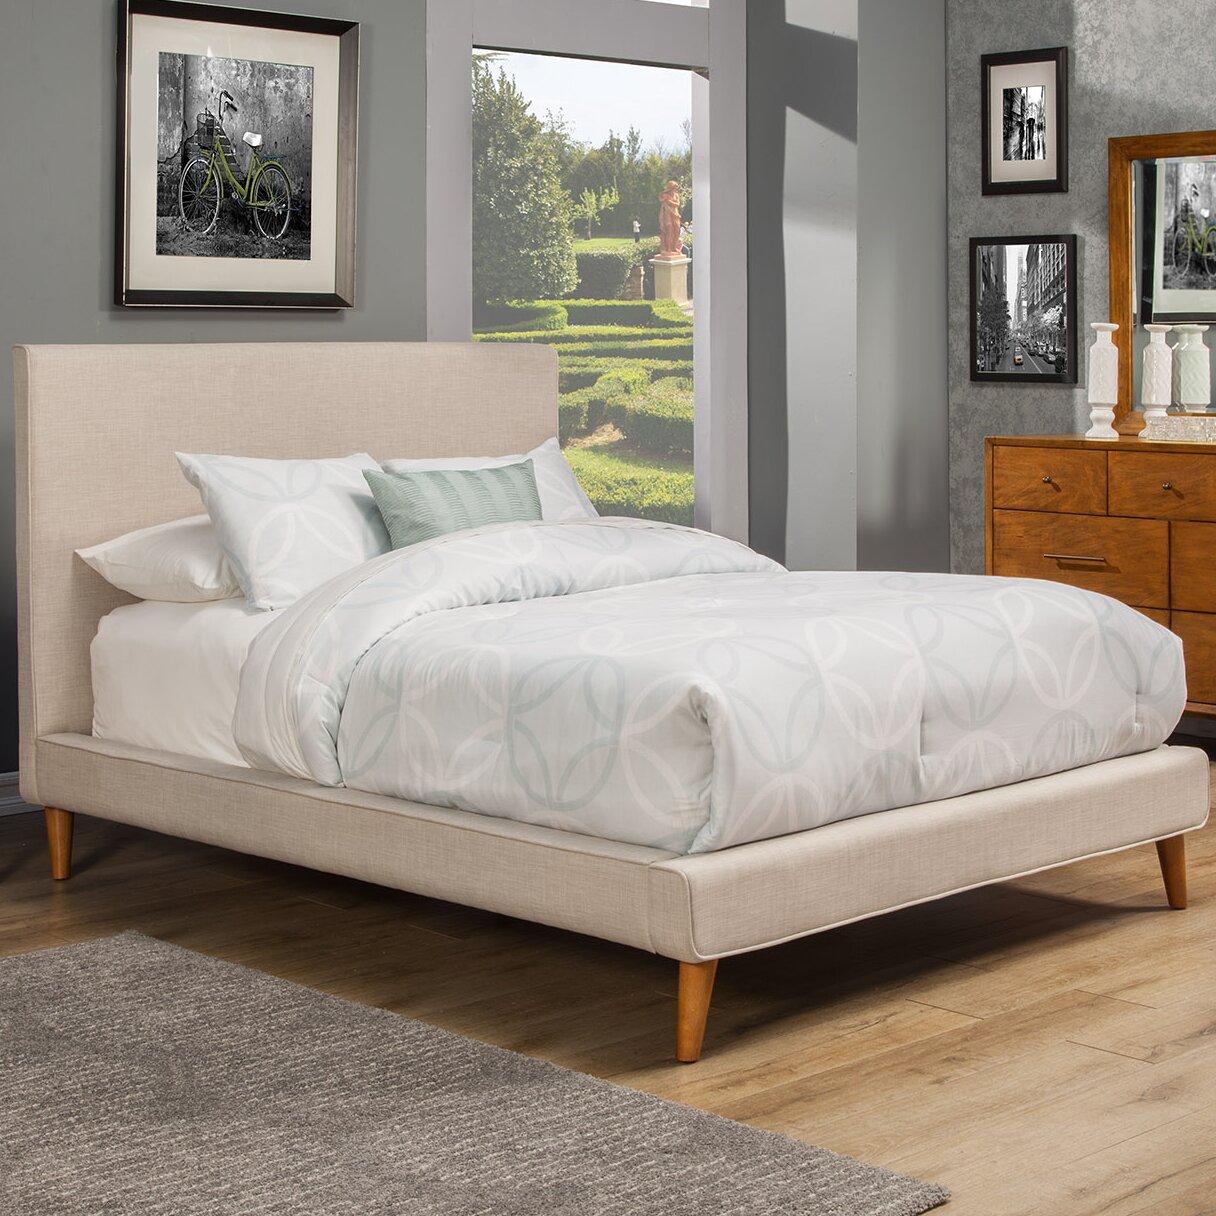 Wayfair All Modern: Langley Street Parocela Upholstered Platform Bed & Reviews